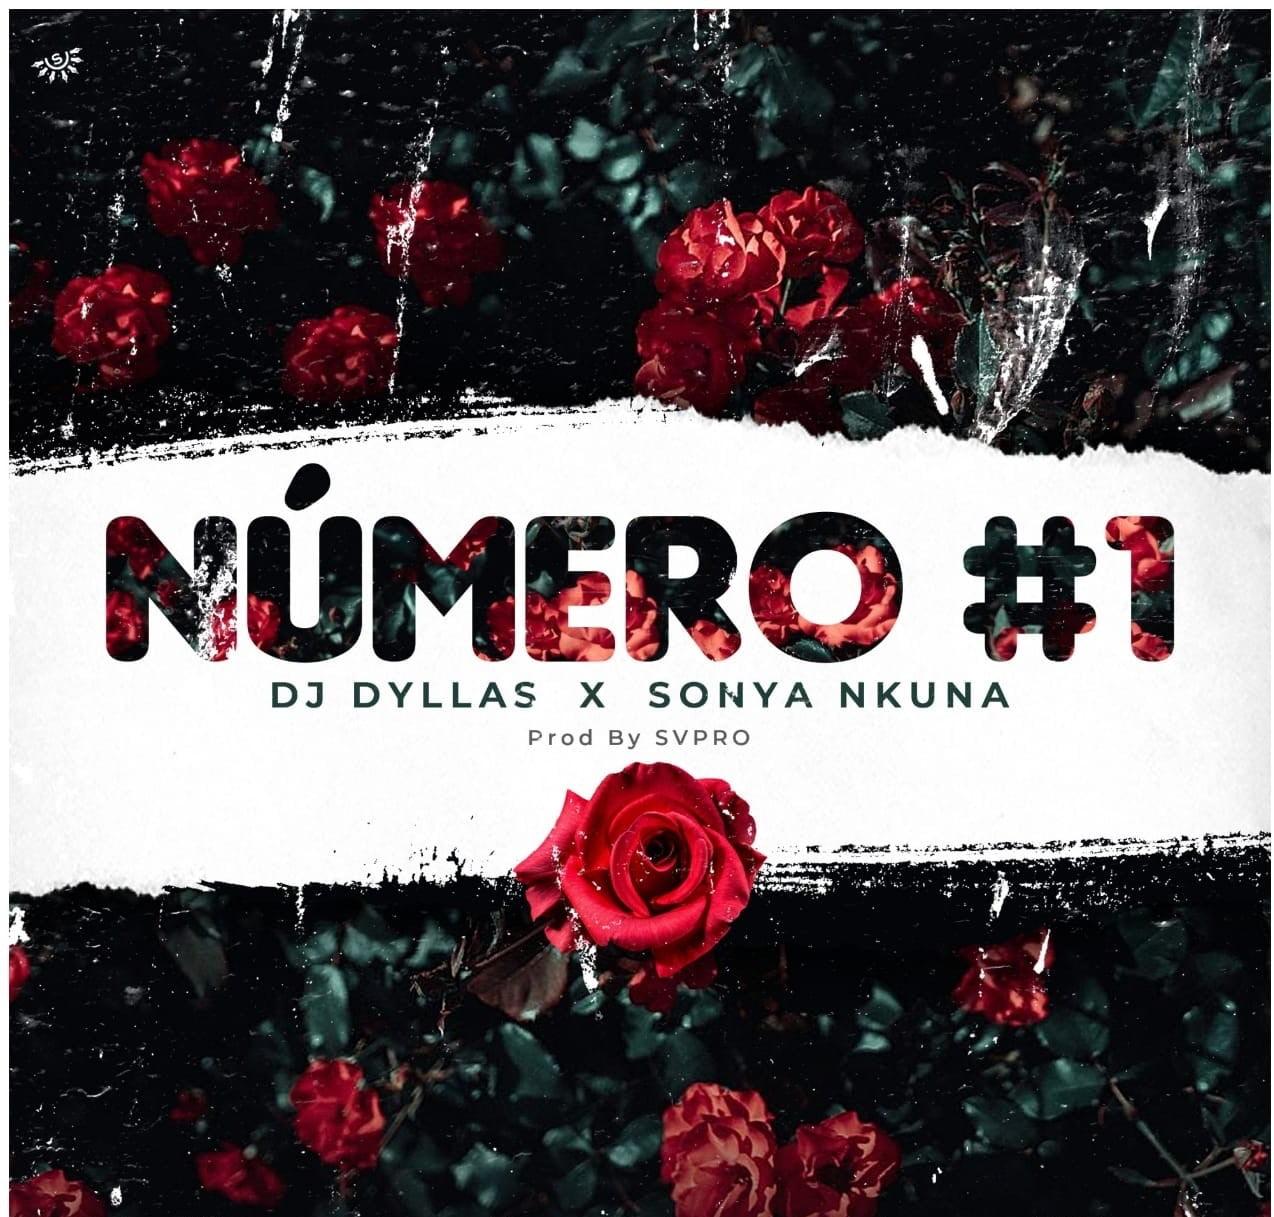 Dj Dyllas ft Sonya Nkuna - Numero 1